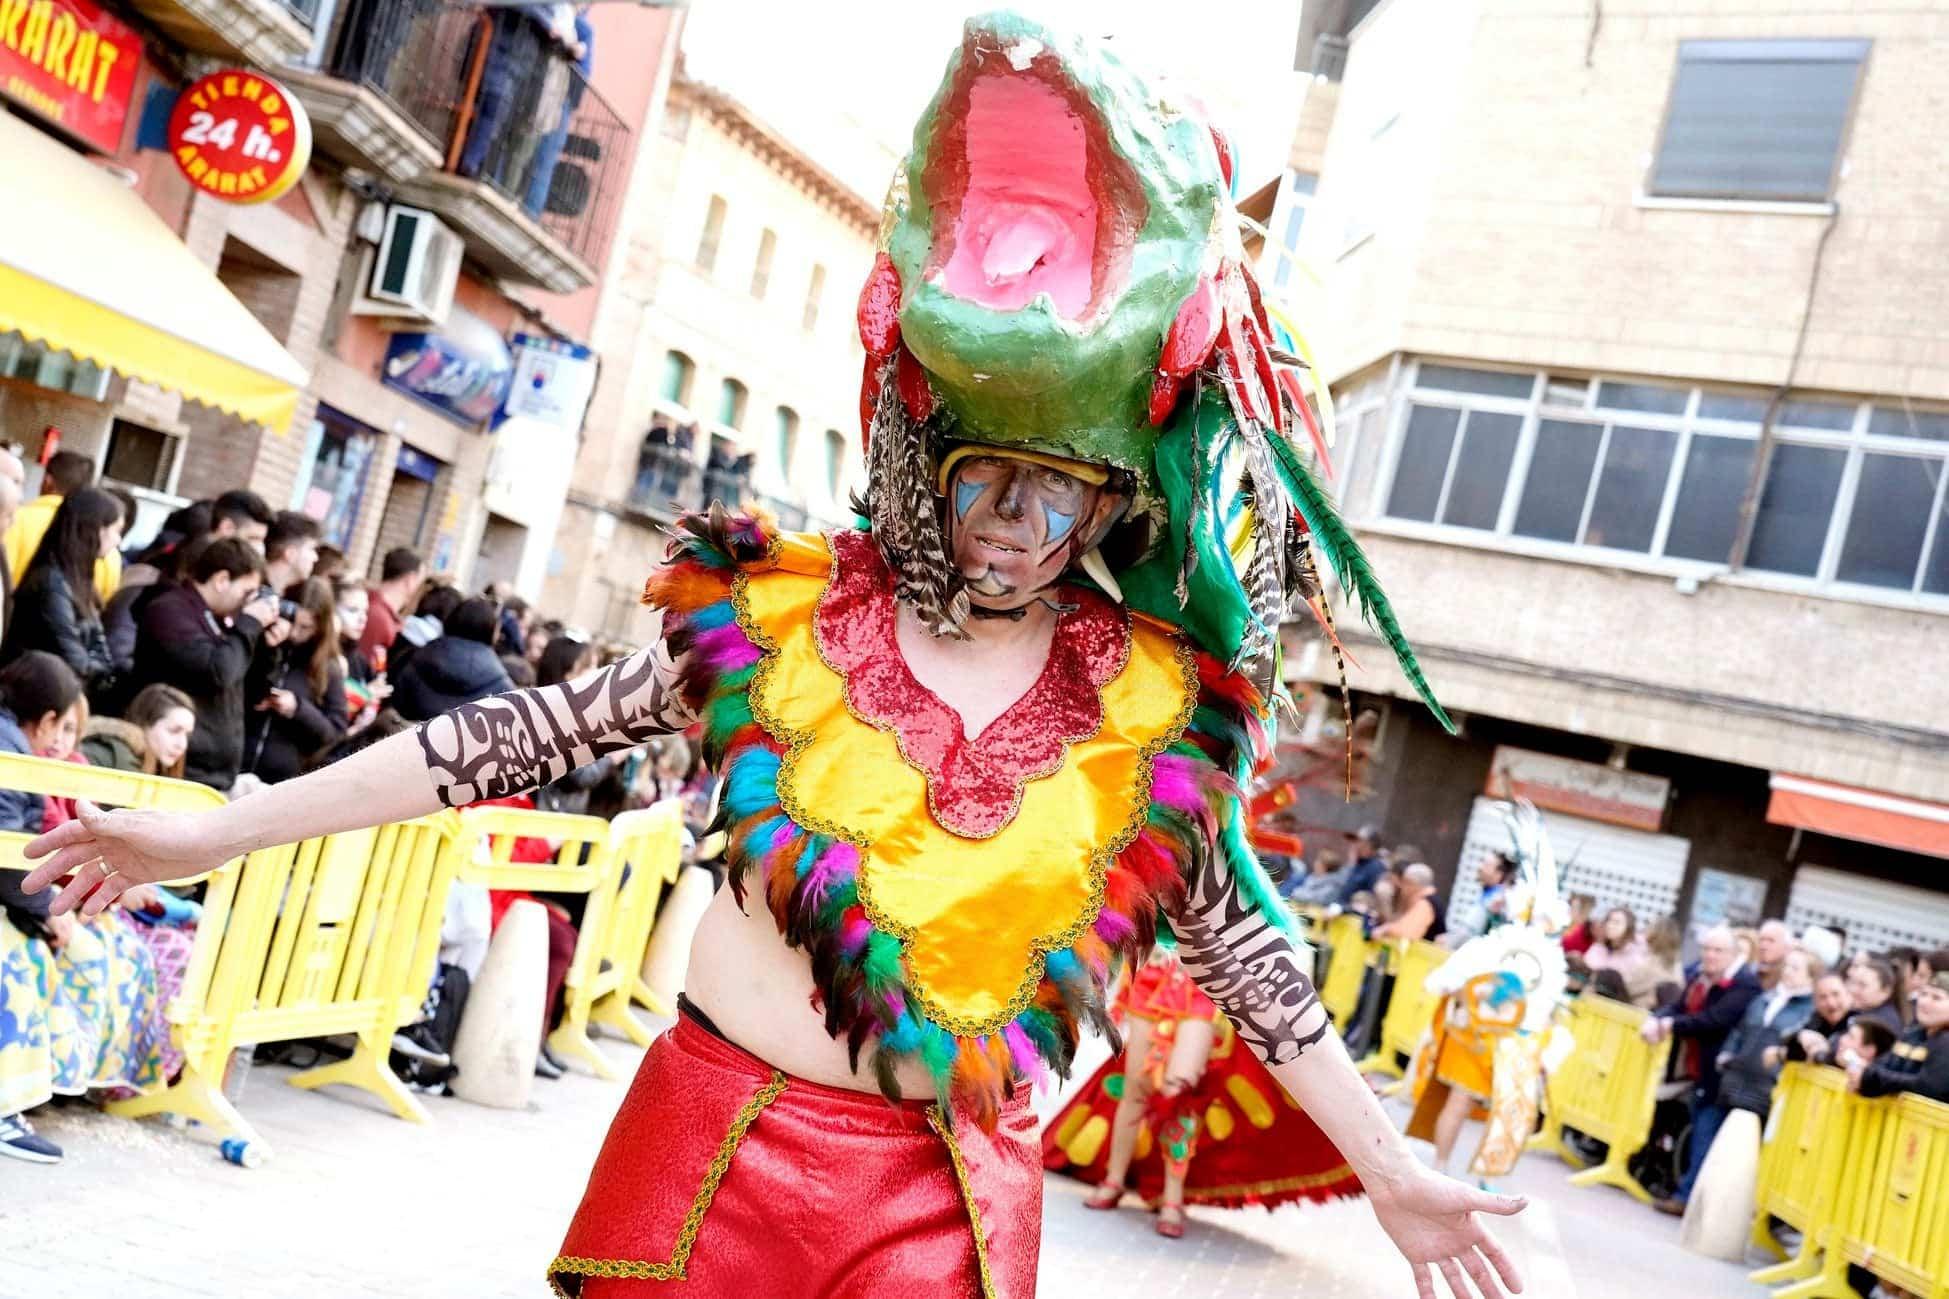 Carnaval de herencia 2020 ofertorio 35 - Selección de fotografías del Ofertorio del Carnaval de Herencia